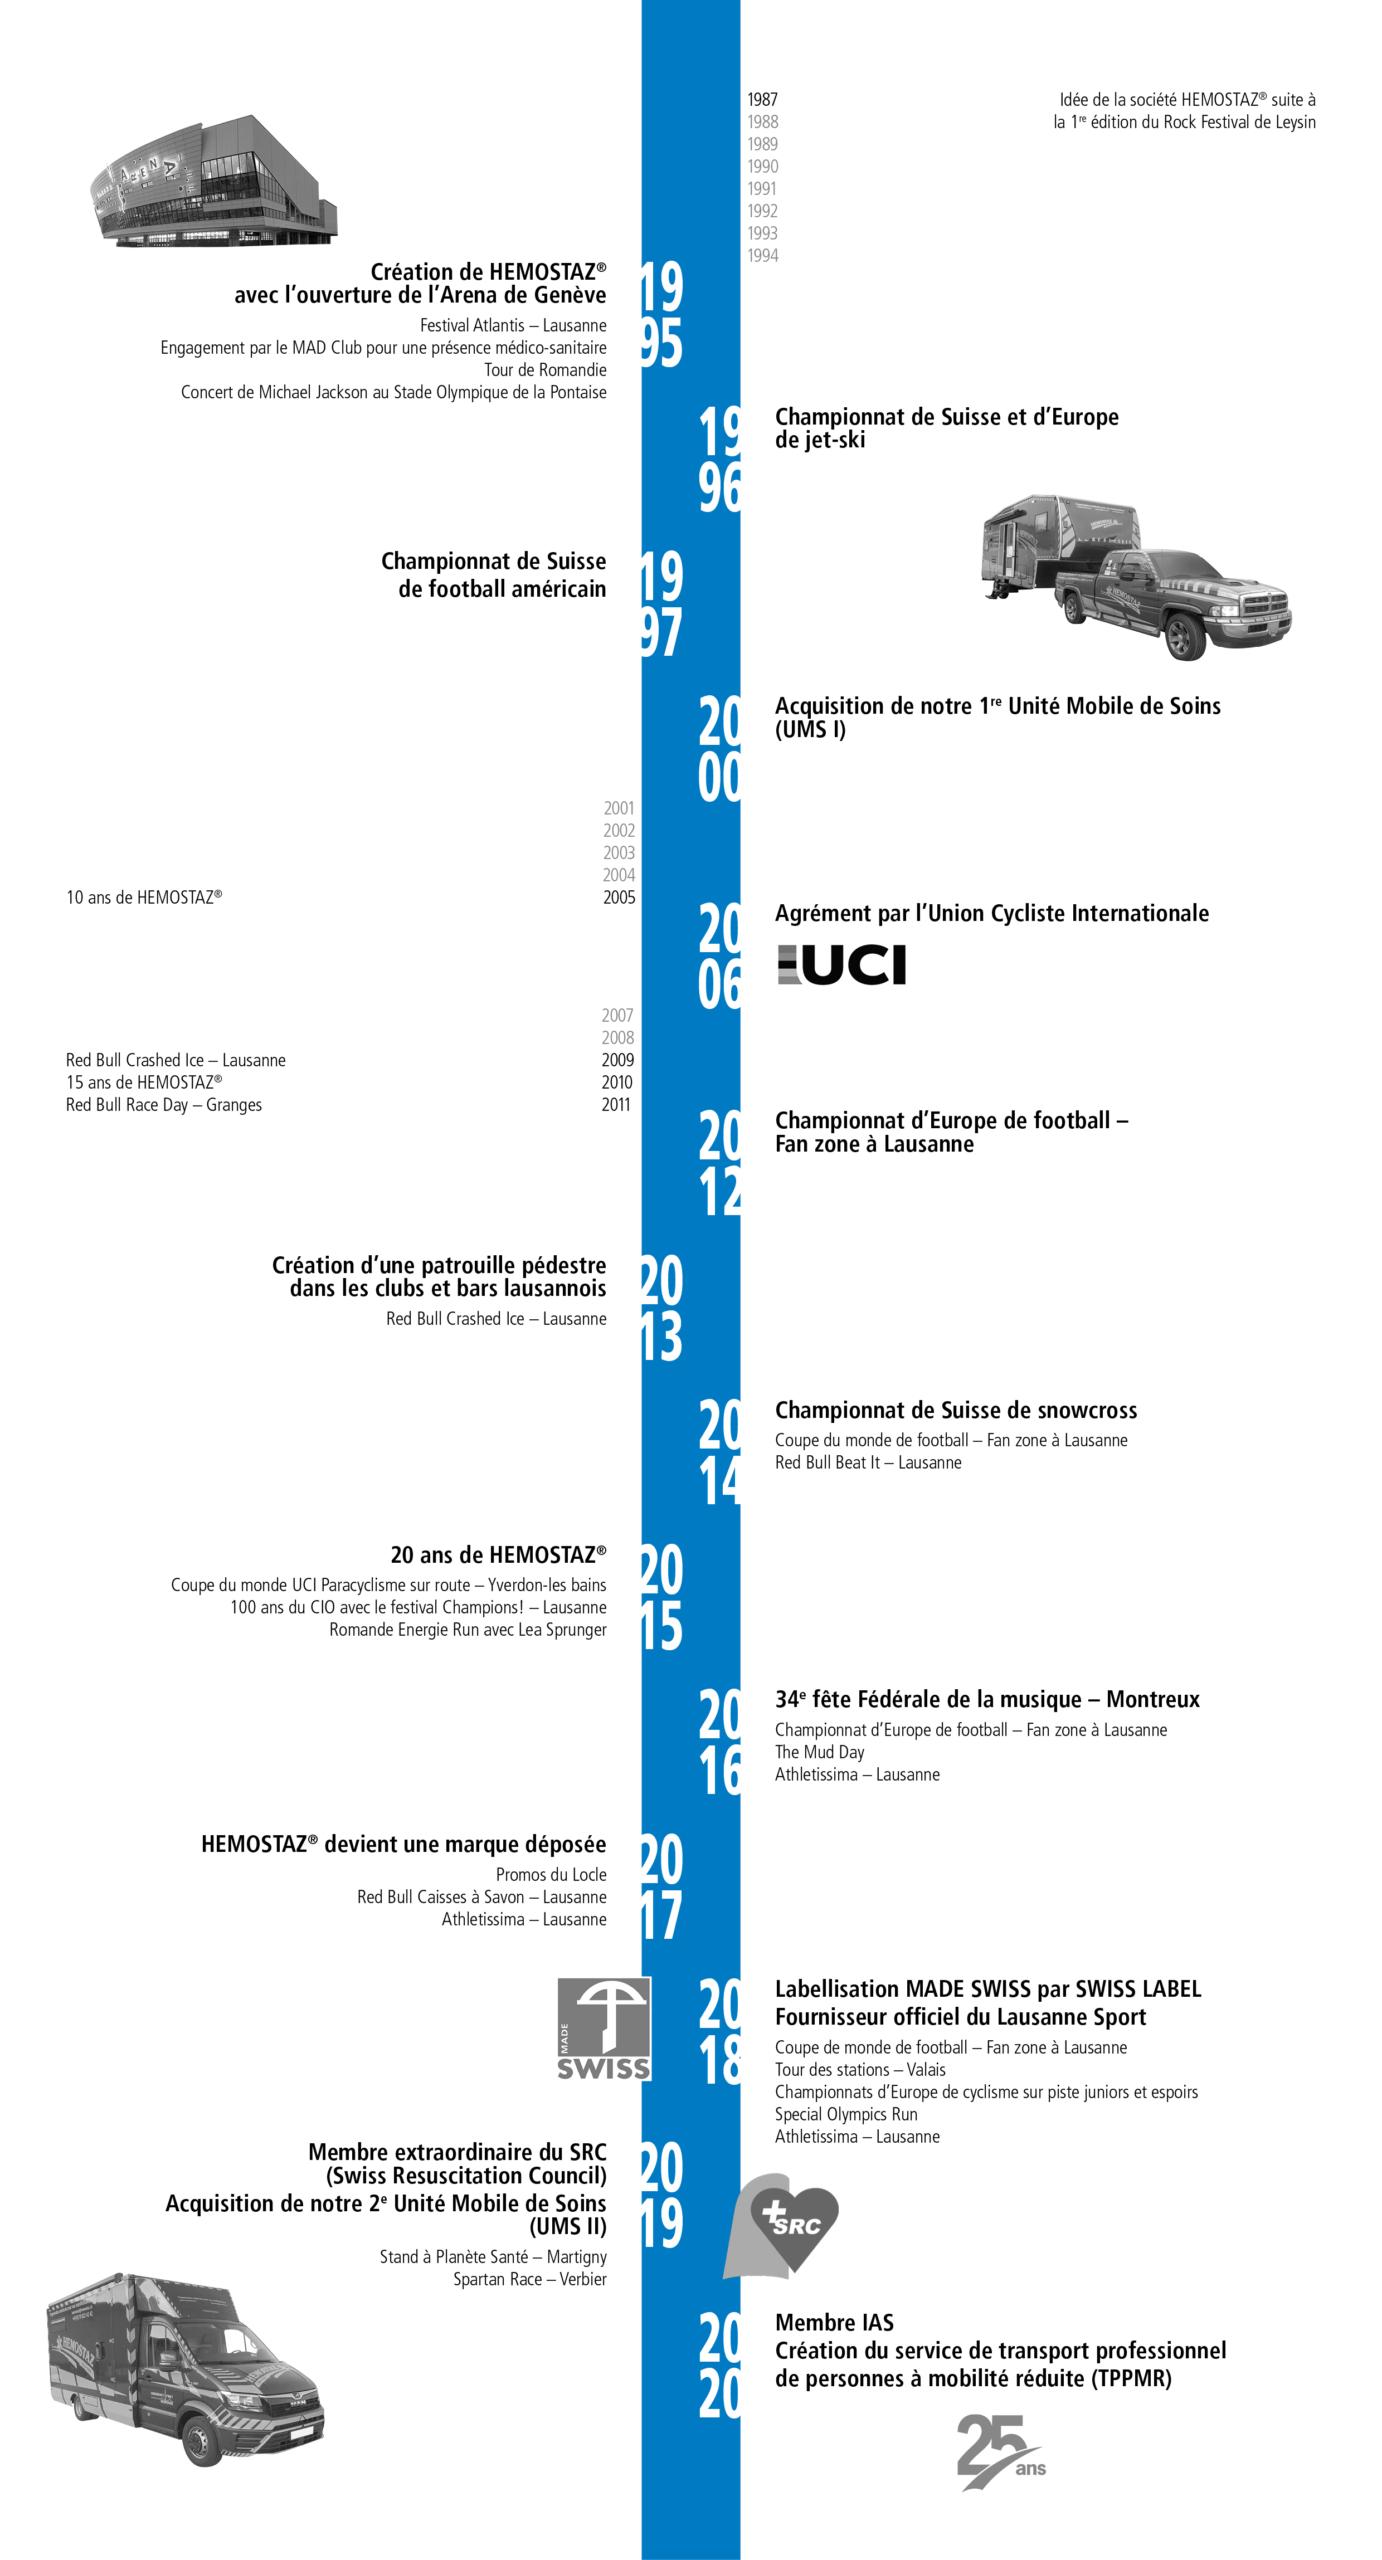 HEMOSTAZ ⎮ Chronologie historique de la société HEMOSTAZ